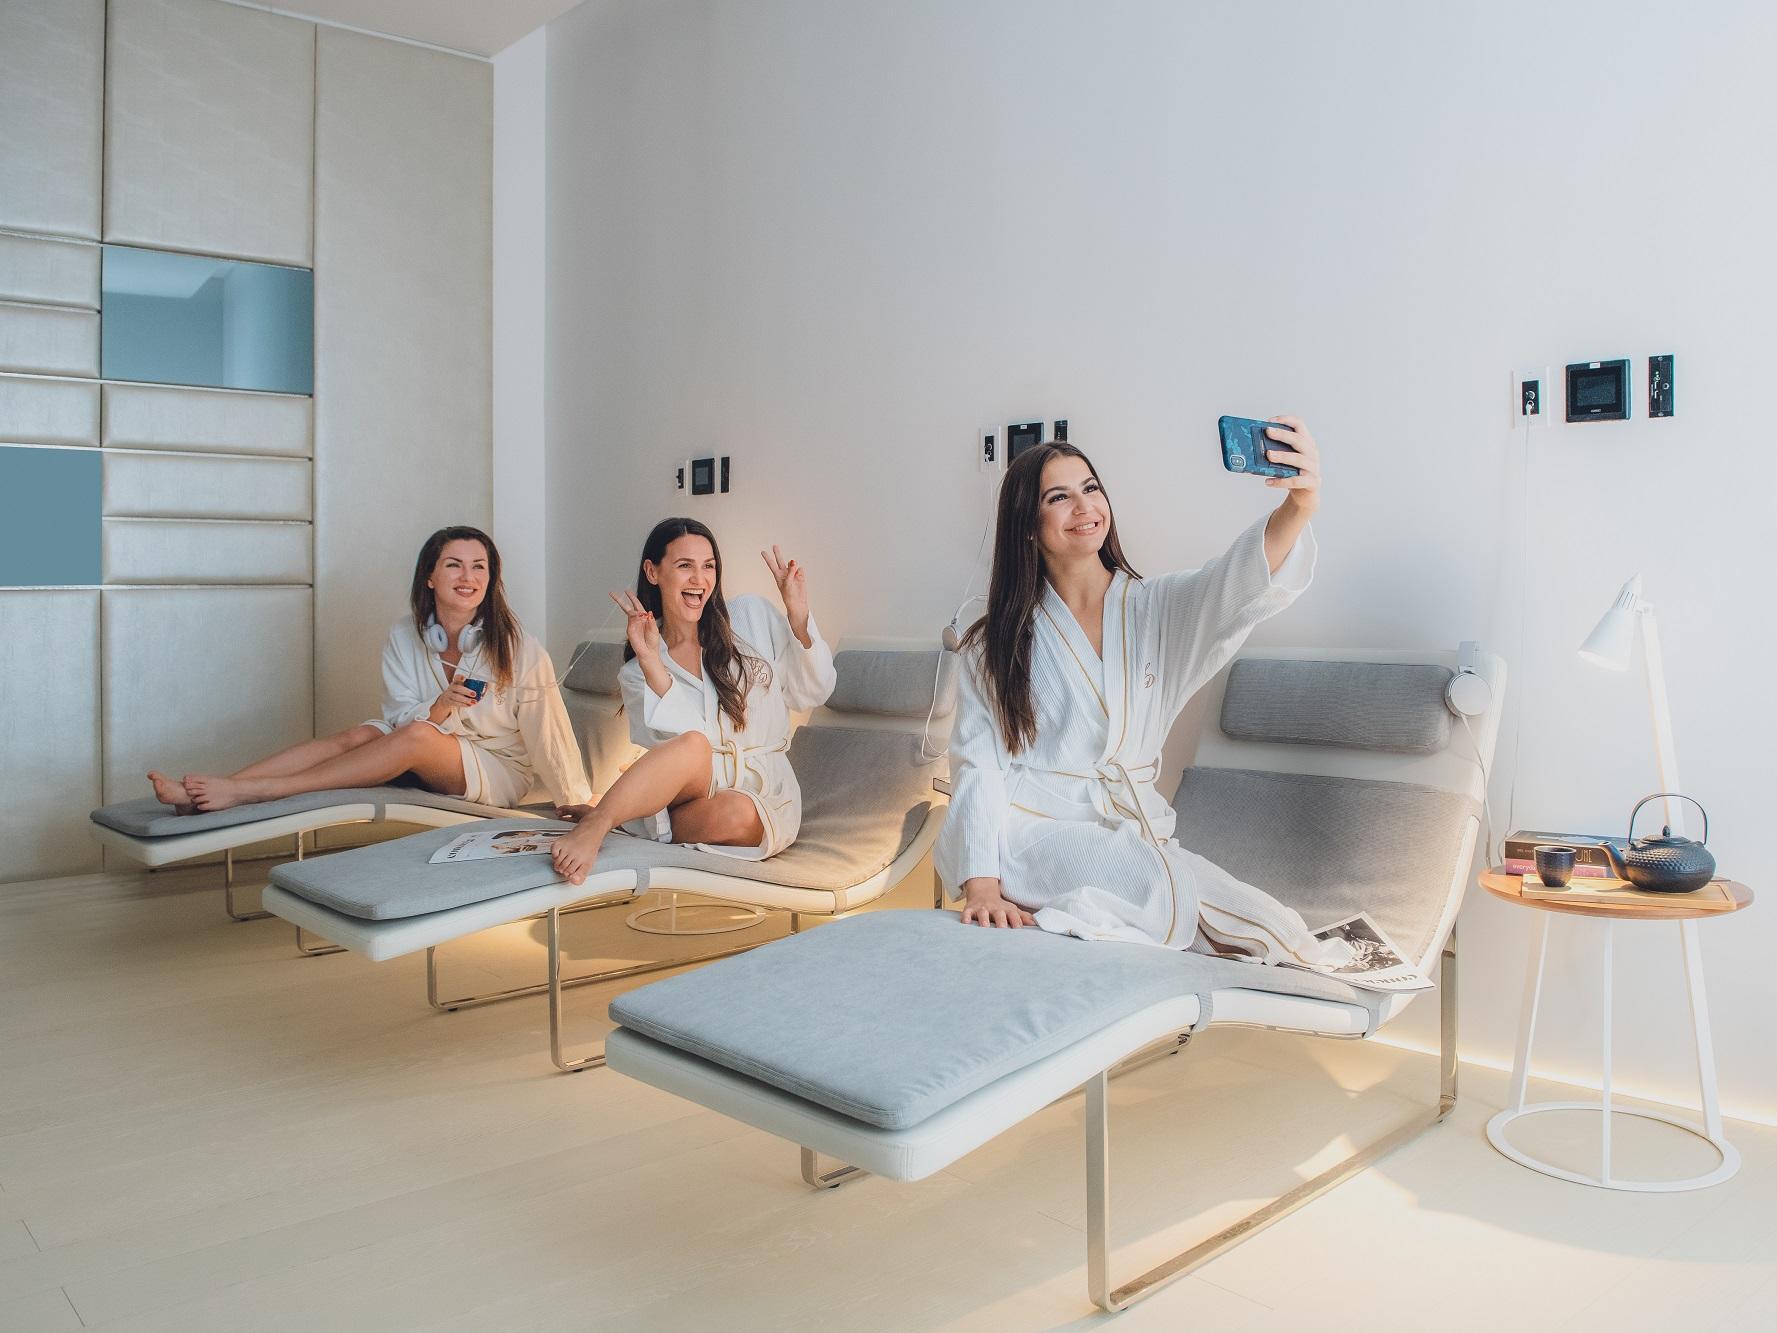 Pause Spa Treatment Room